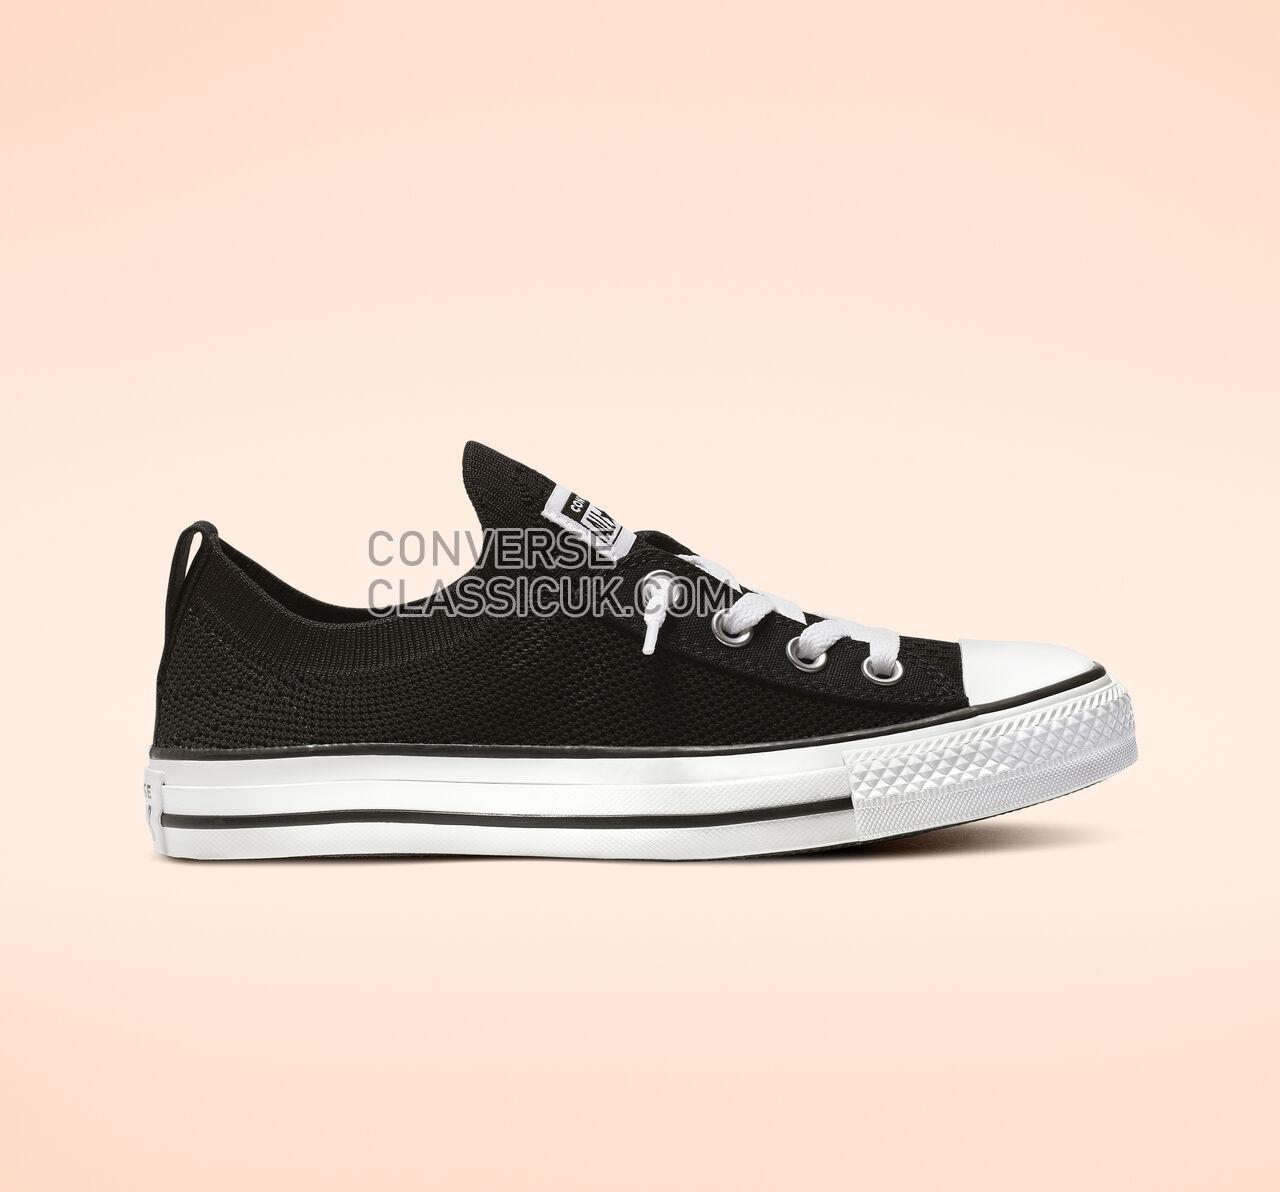 Converse Chuck Taylor All Star Shoreline Knit Slip Womens 565489F Black/White/Black Shoes